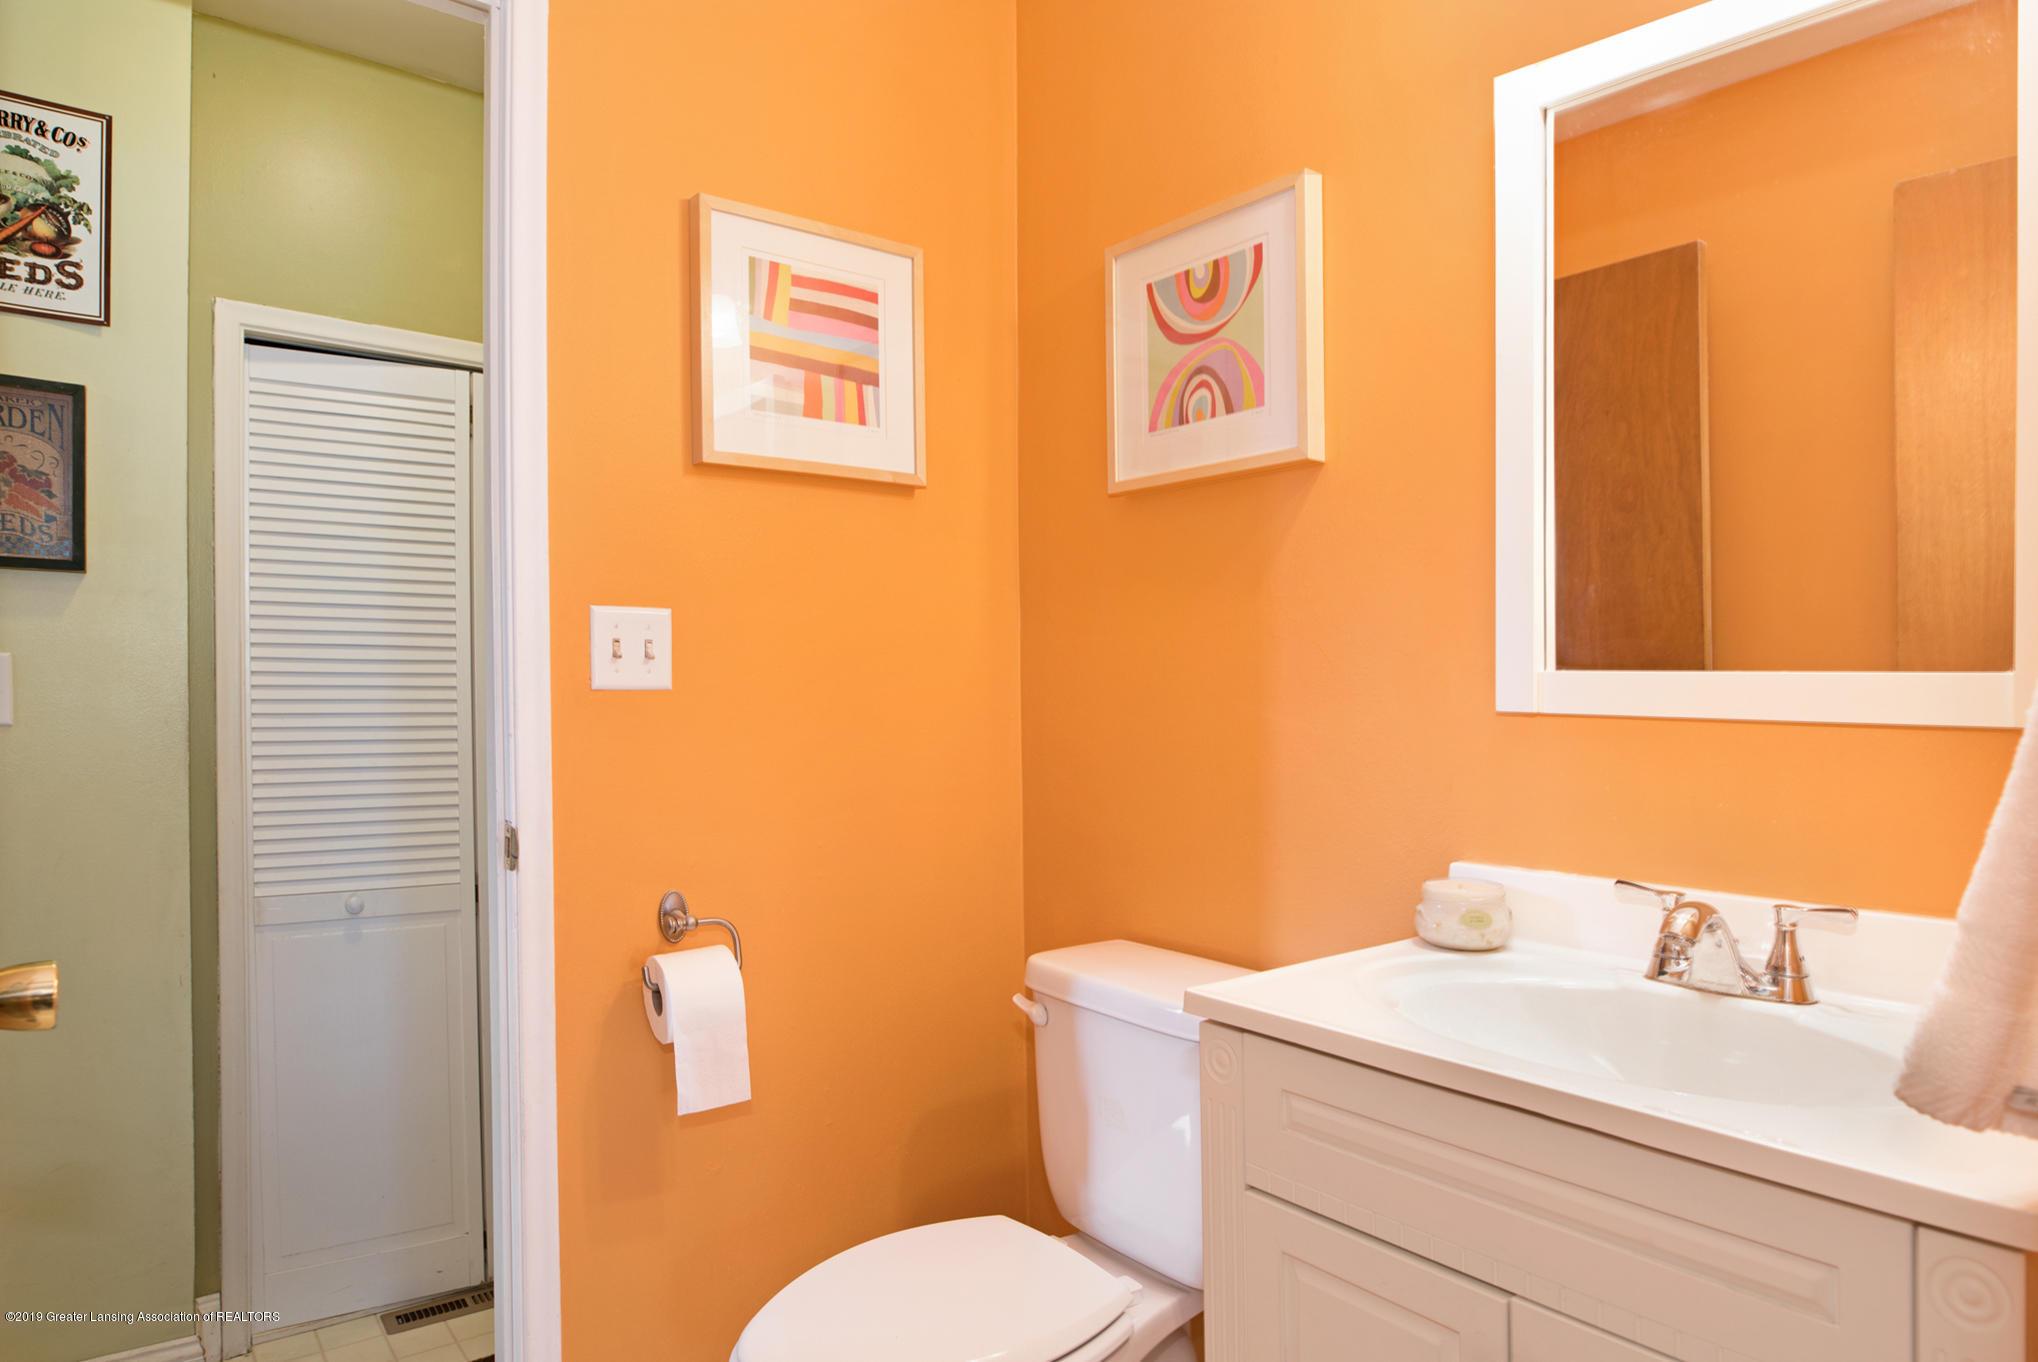 981 Ramblewood Dr - Bathroom 2 - 23